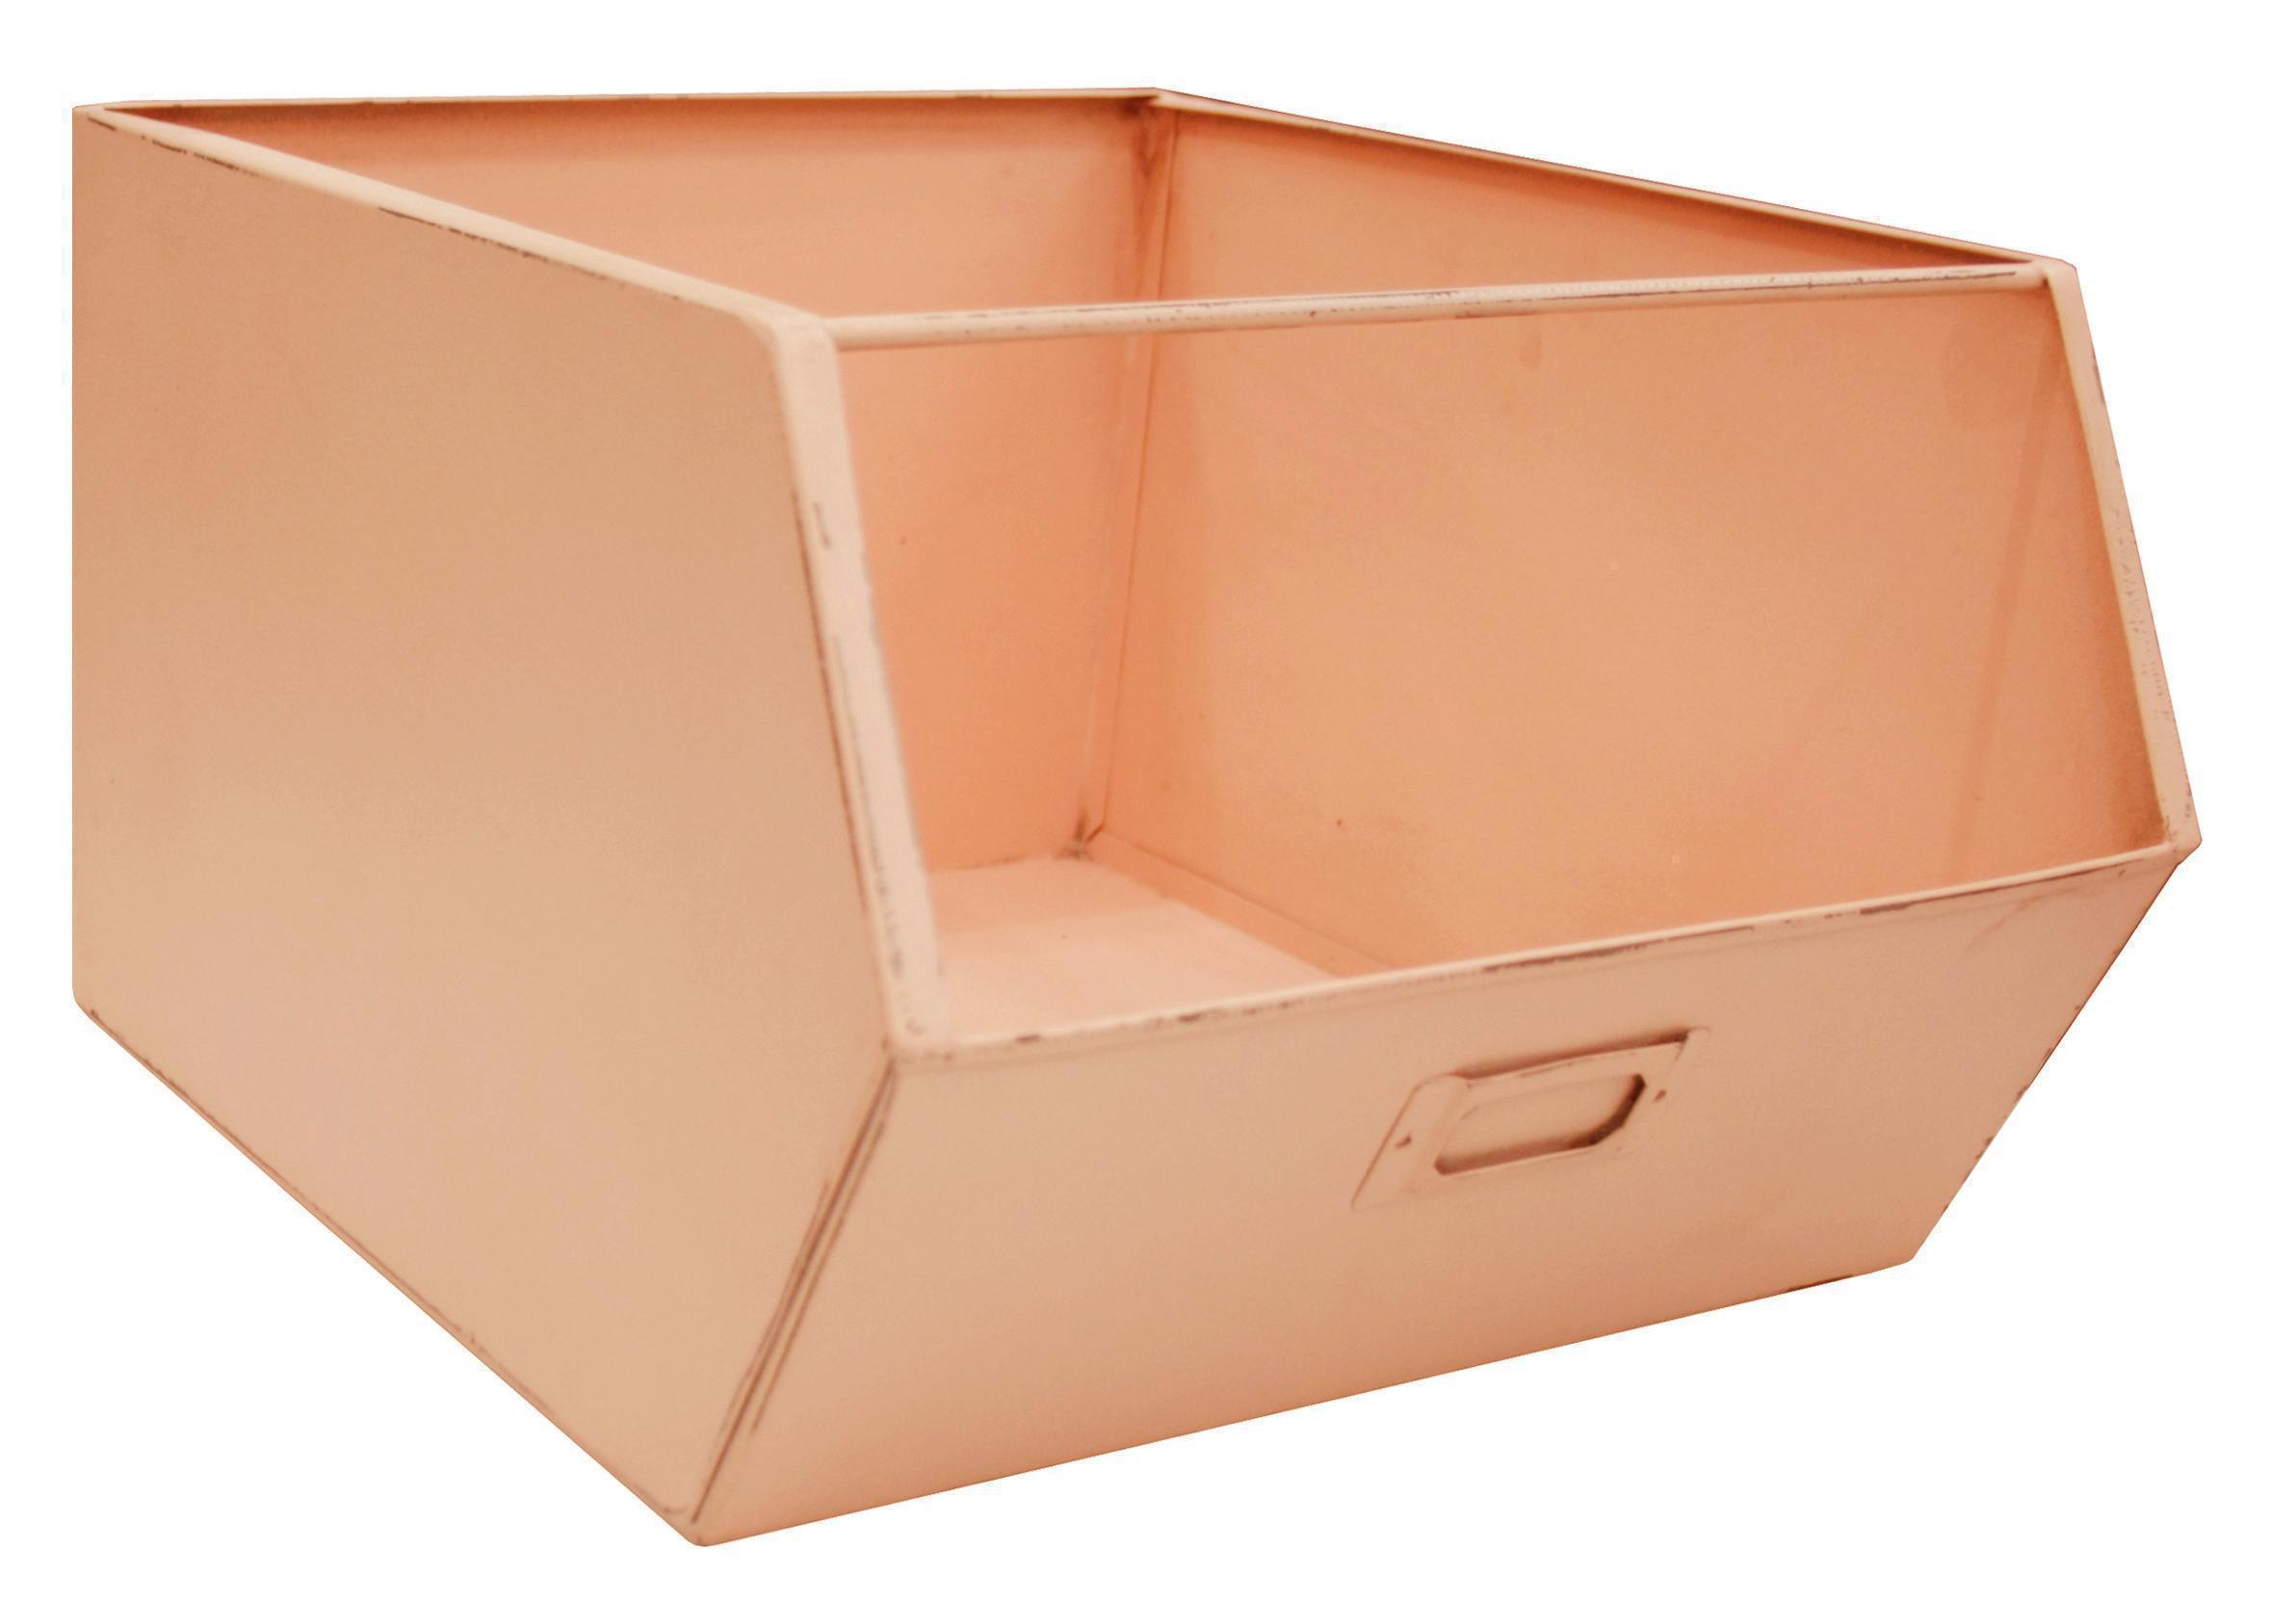 kidsdepot aufbewahrungsbox metall rosa ordnung im. Black Bedroom Furniture Sets. Home Design Ideas